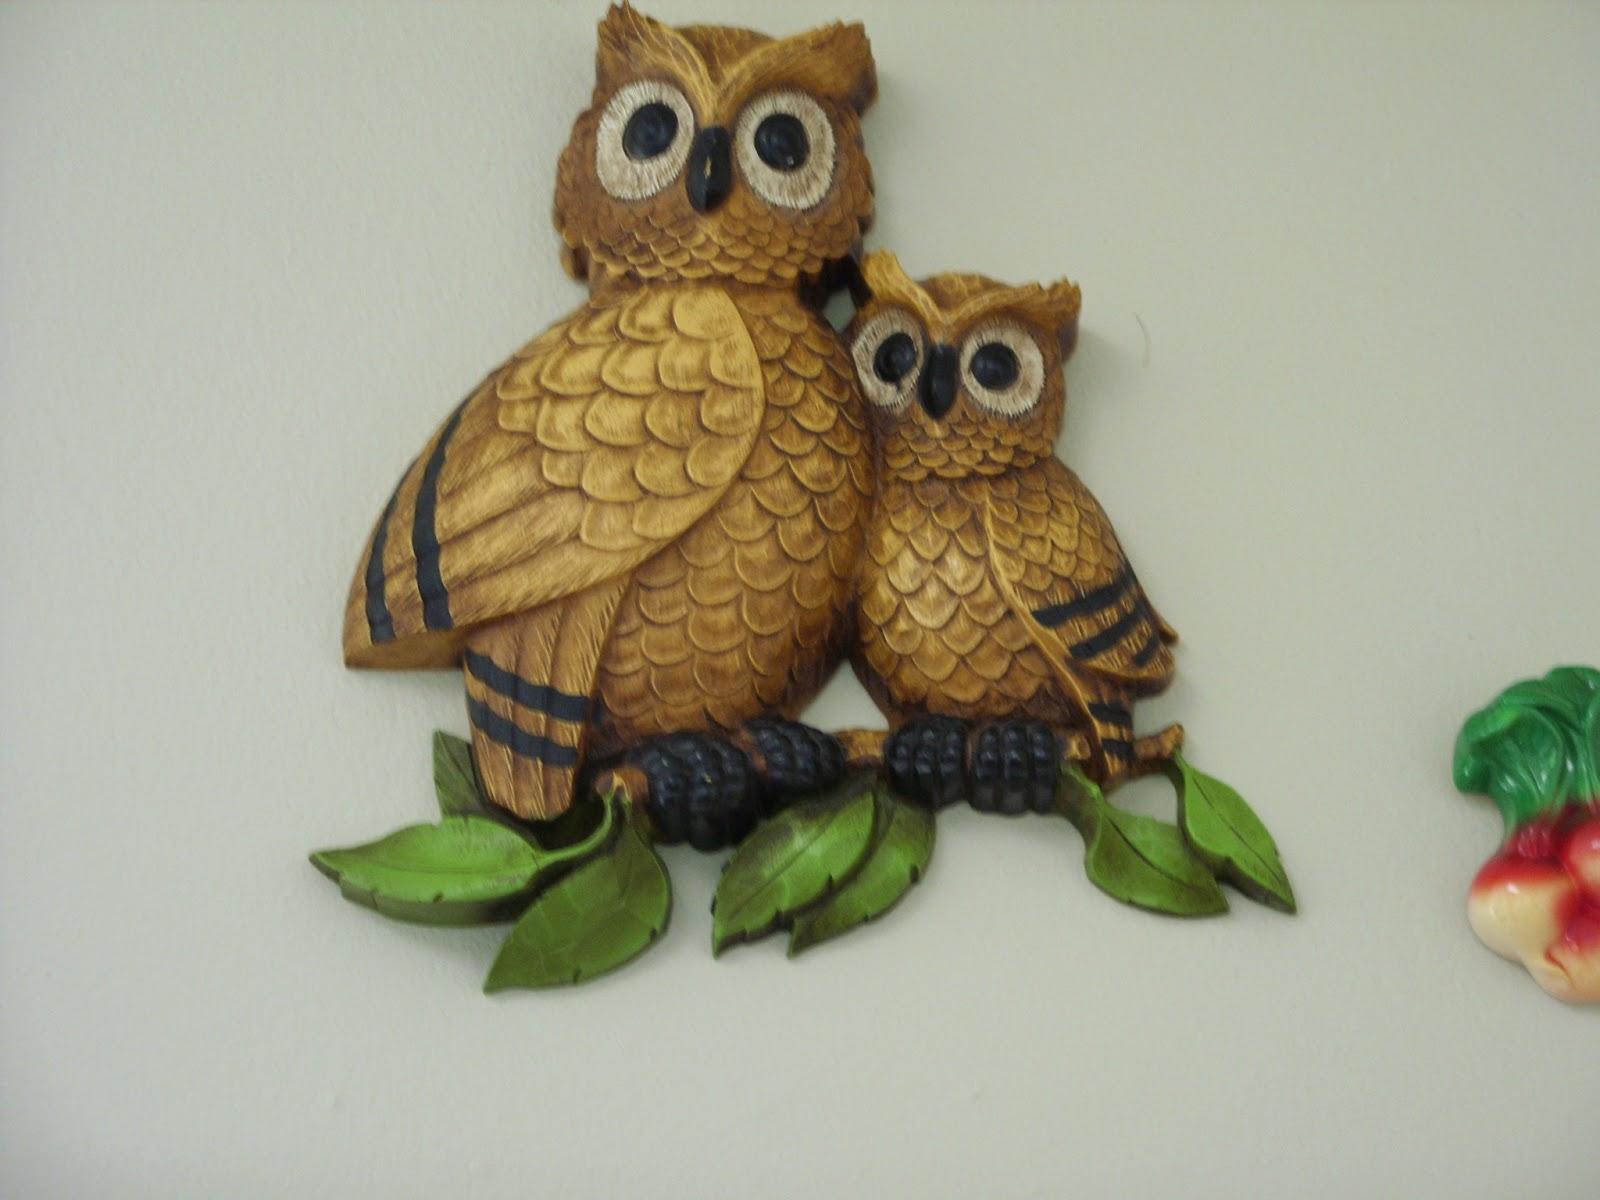 Eat The Blog: I Hung a Couple of Owls, Now I Gotta Go Hang a Rat